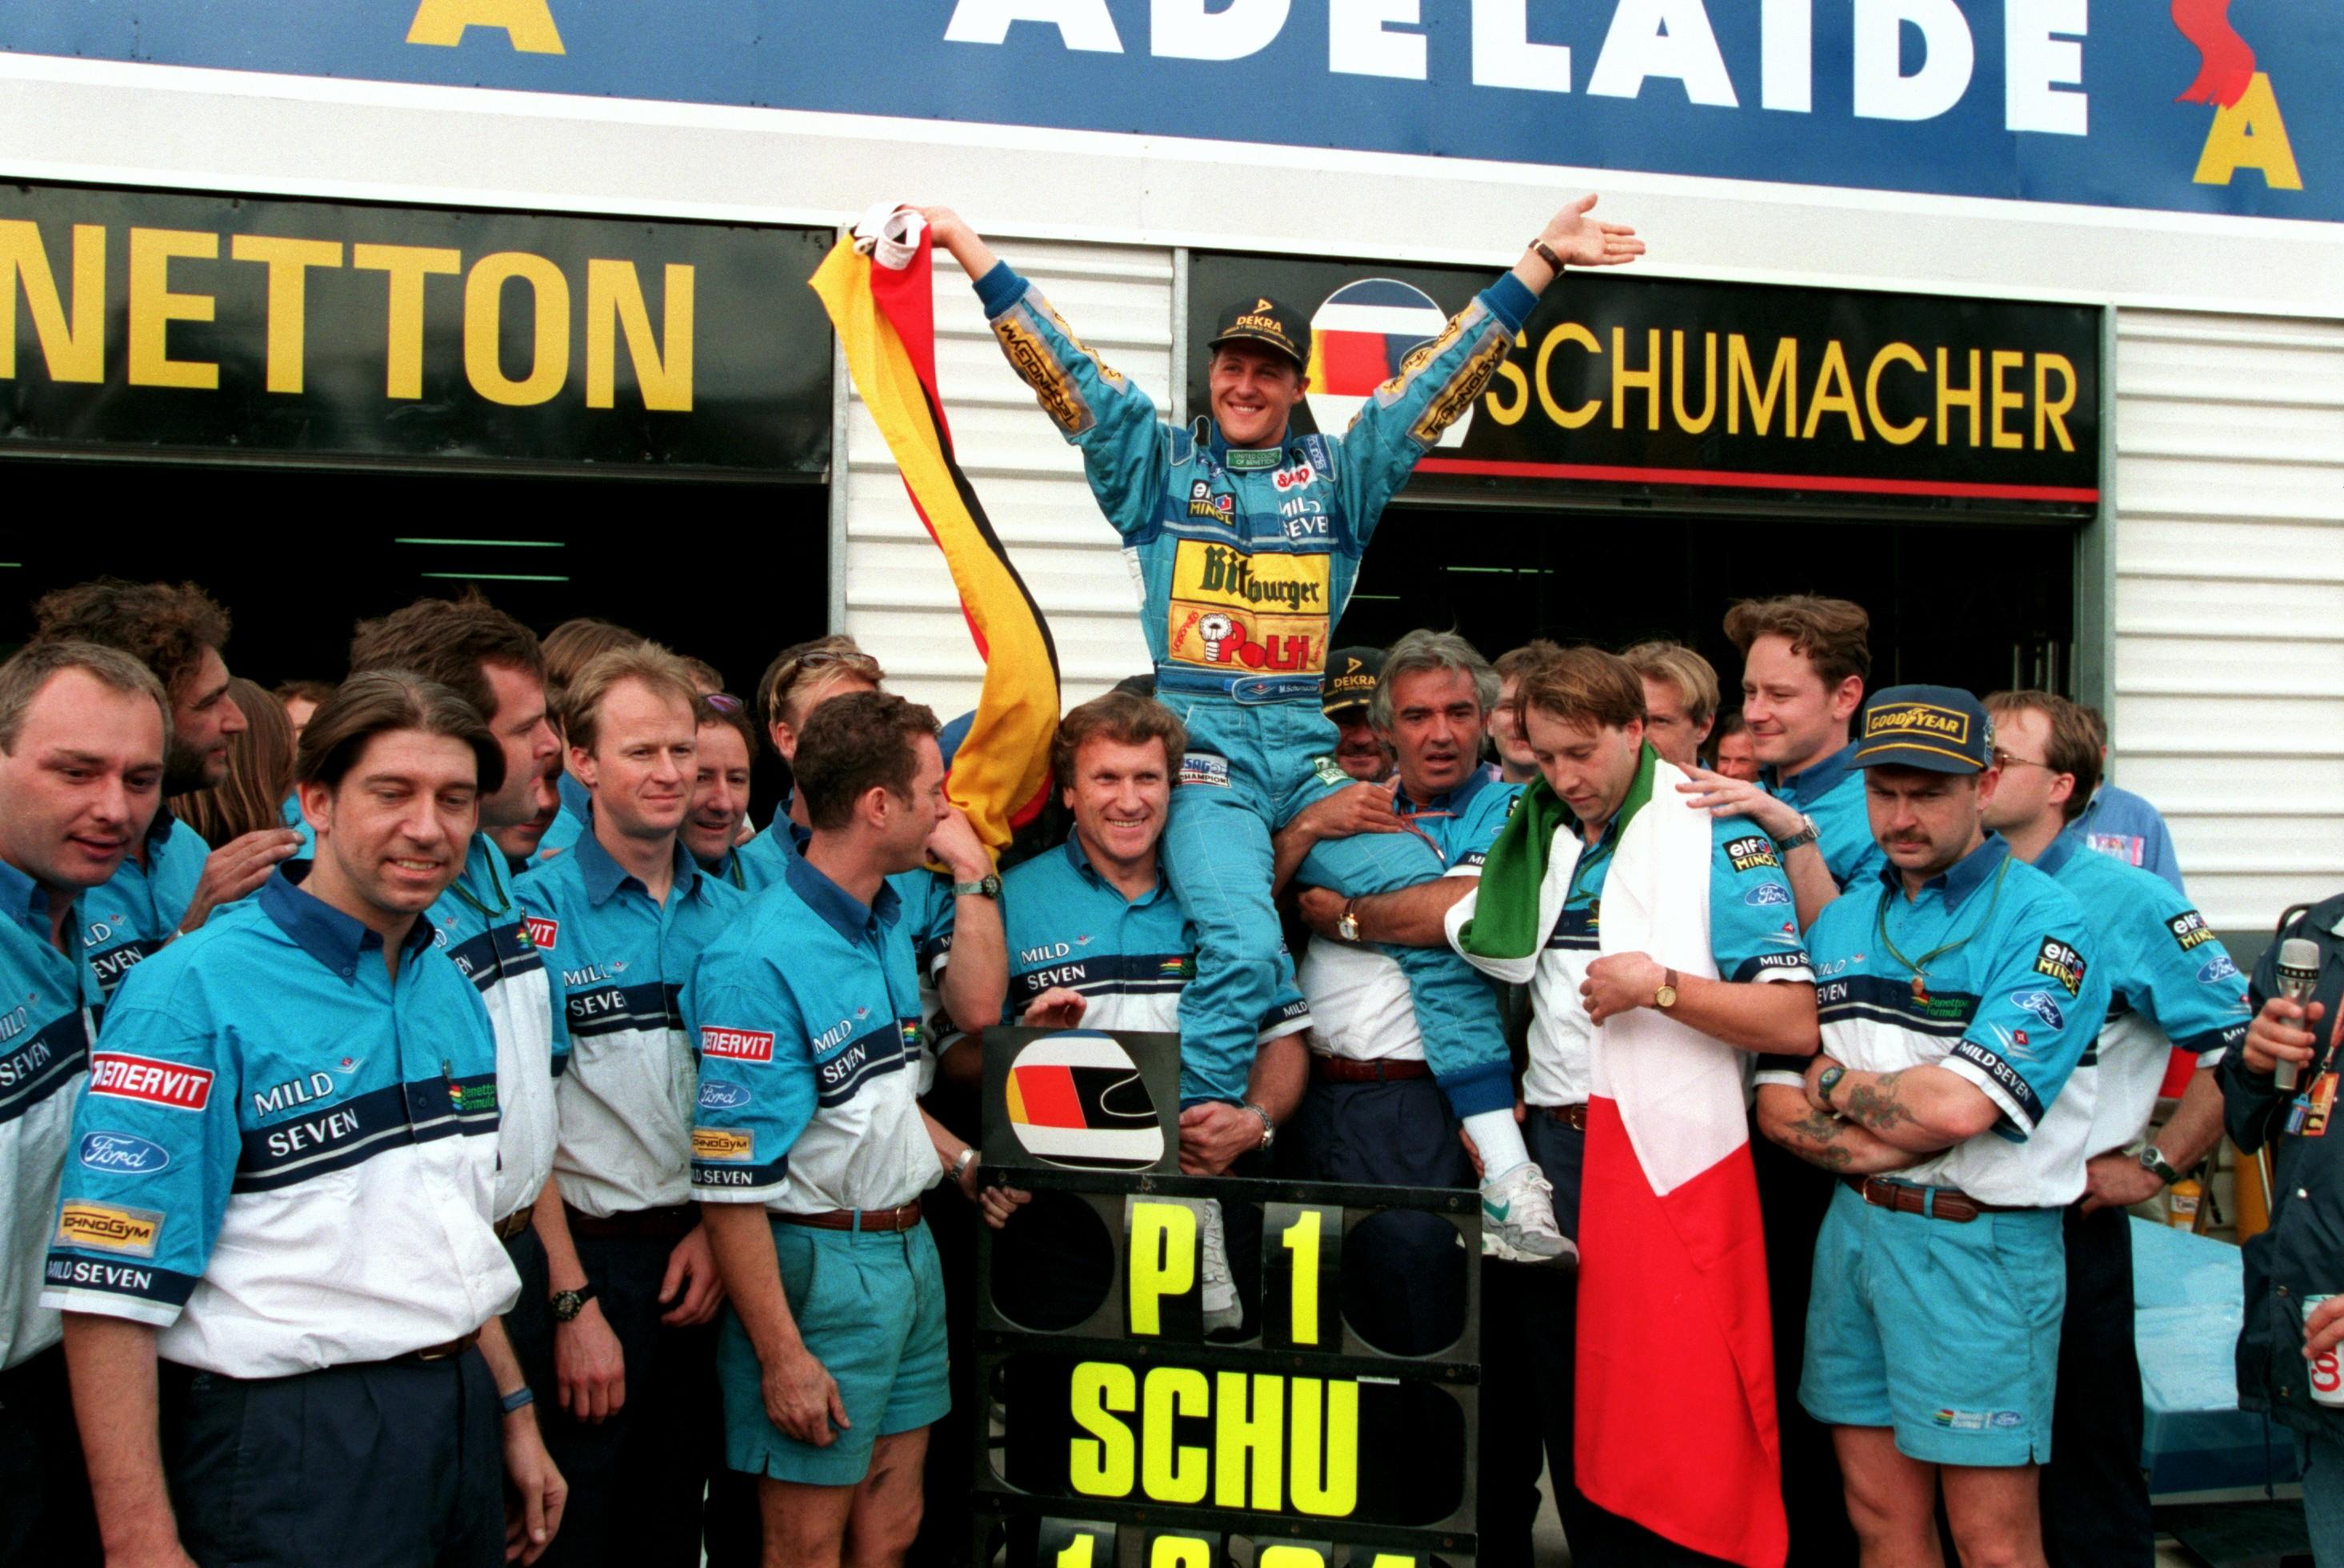 Did Formula 1 Legend Michael Schumacher Cheat in 1994?